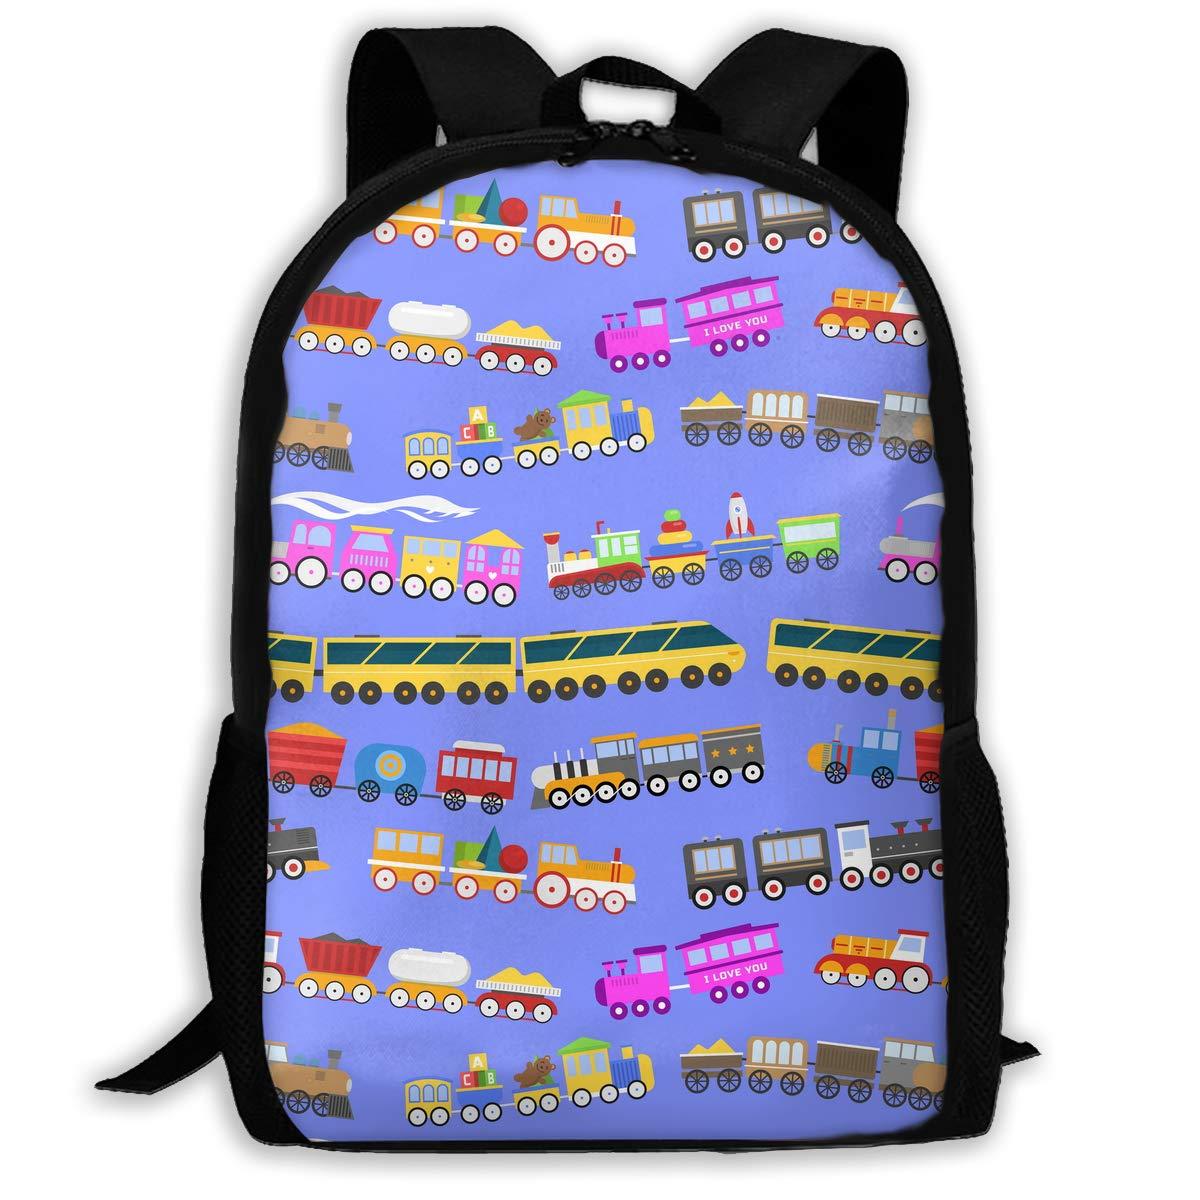 688e88c8ddc8 TAOHJS106 Travel Railroad Pattern Waterproof Adult Backpack Shoulder Bag  for Women and Men Premium Durable Rucksack Bookbag Best for Athletic